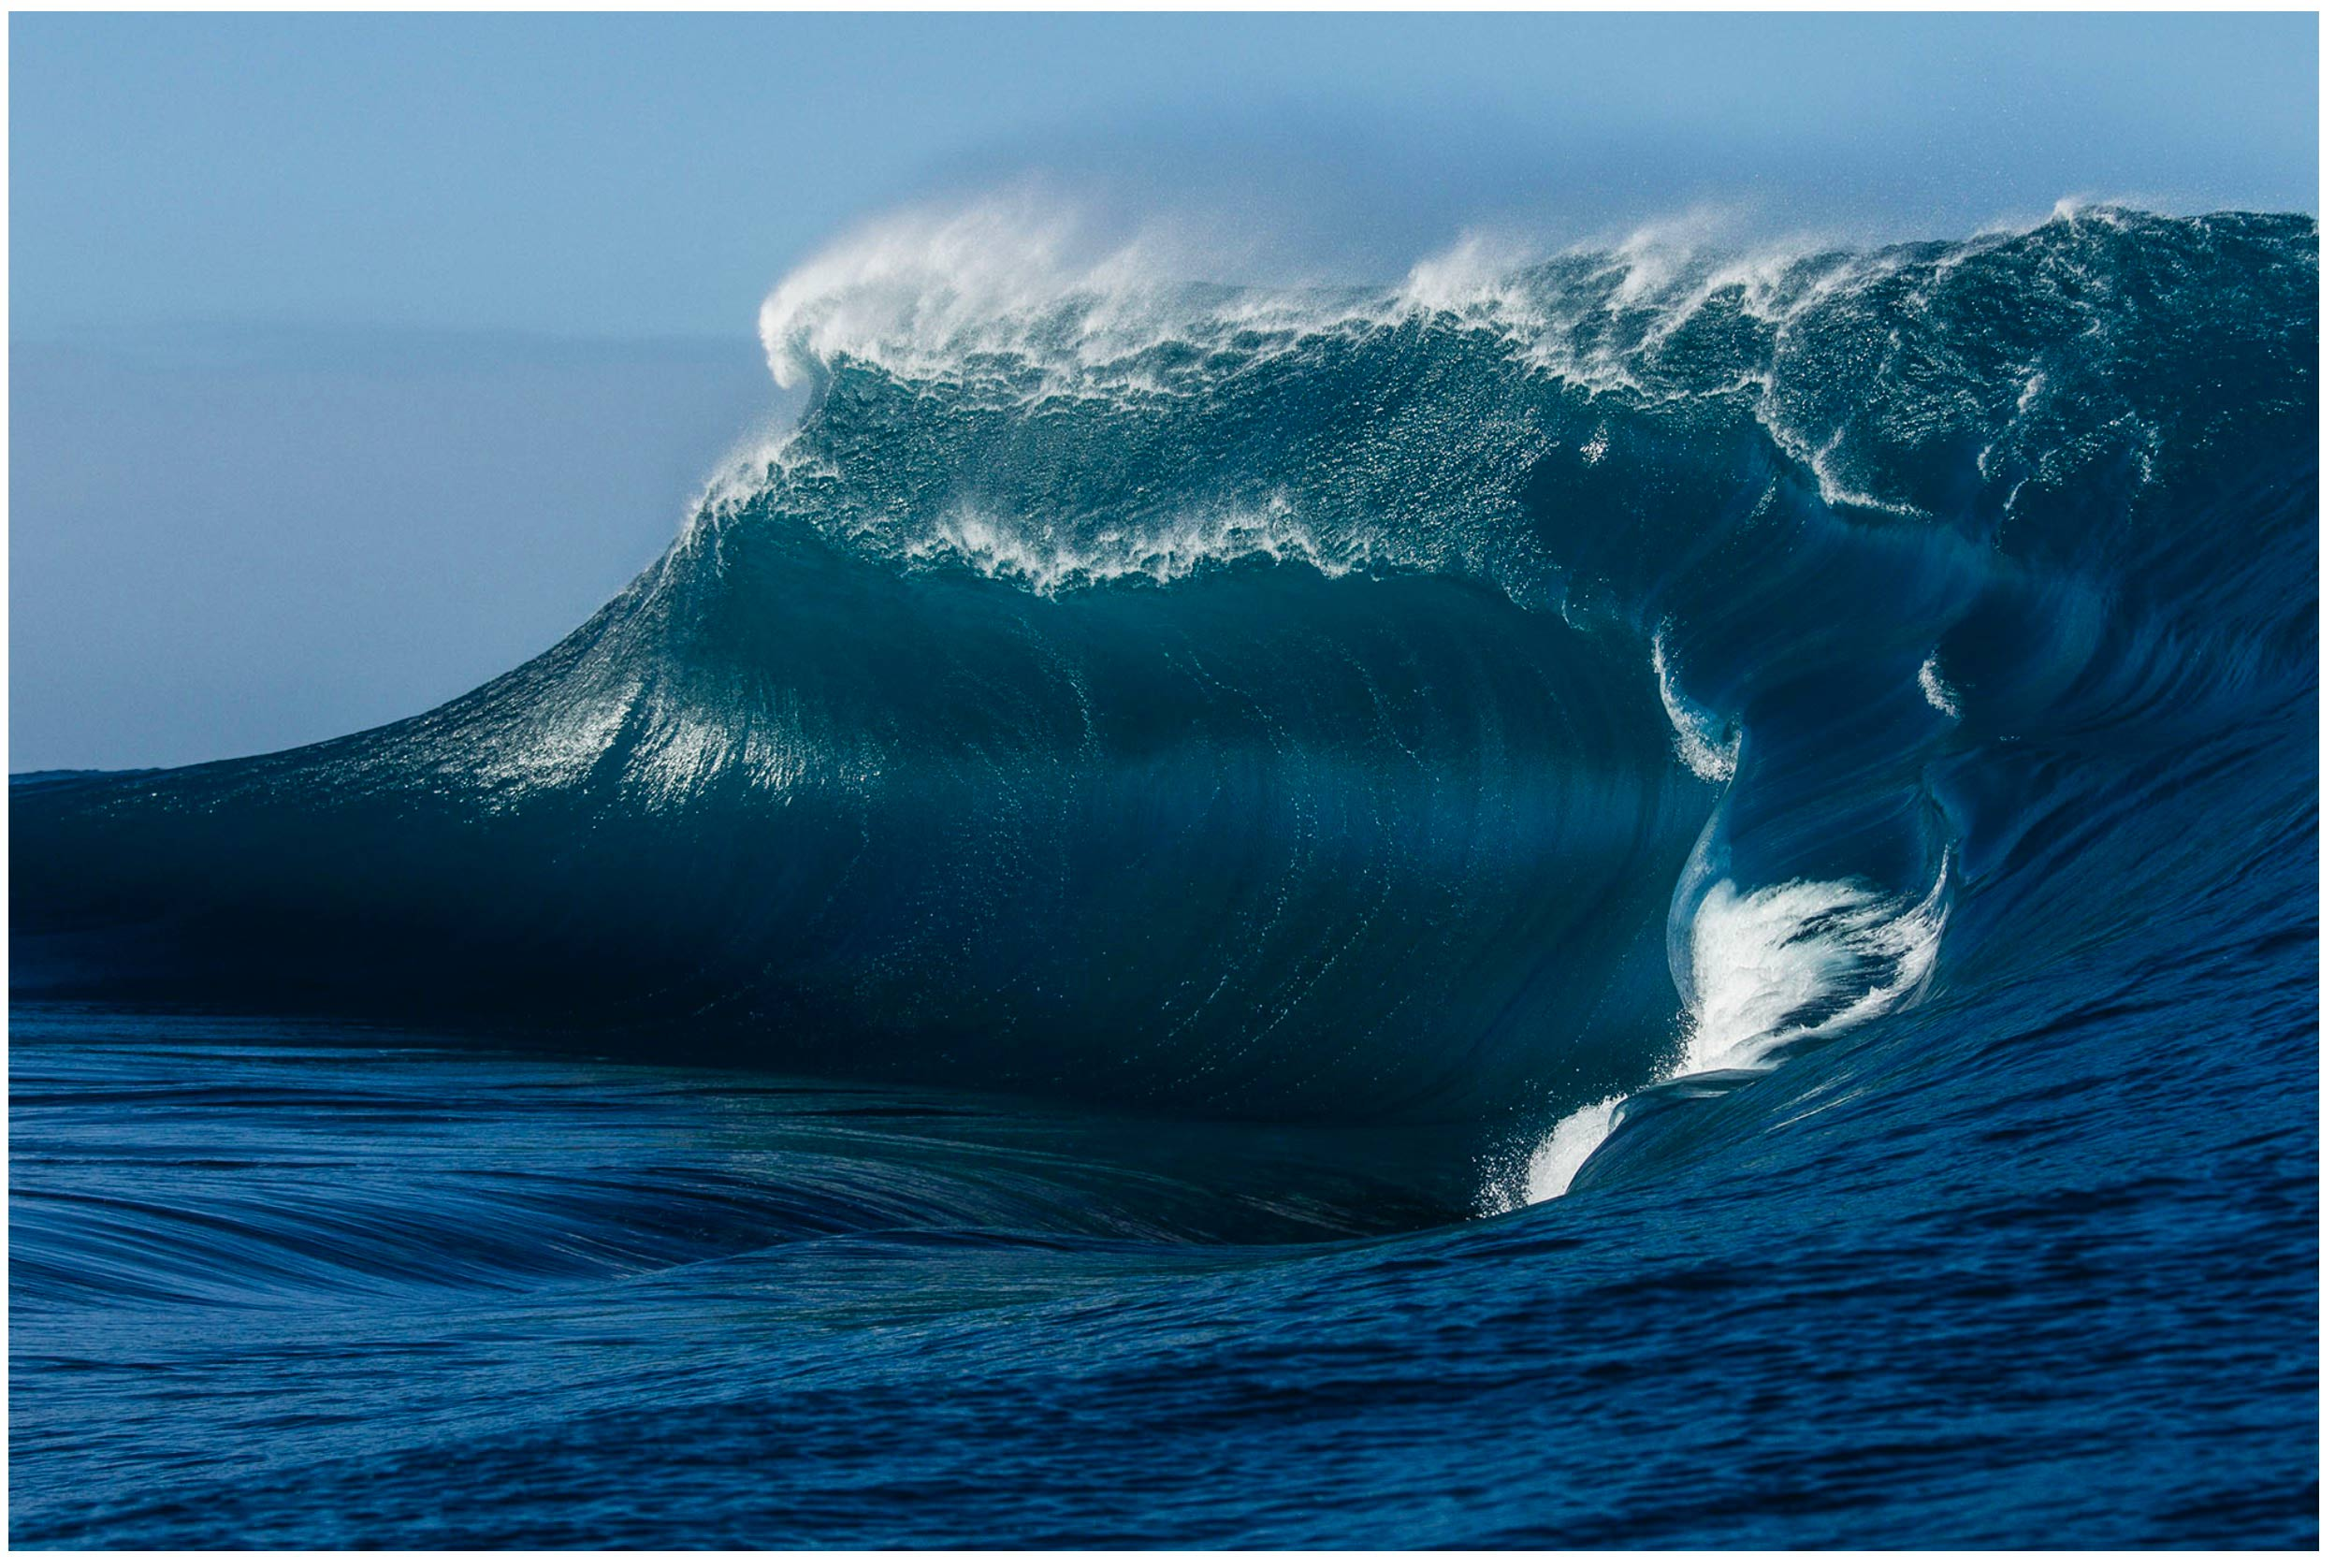 rodd-owen-ocean-surf-photography-for-sale-146.jpg